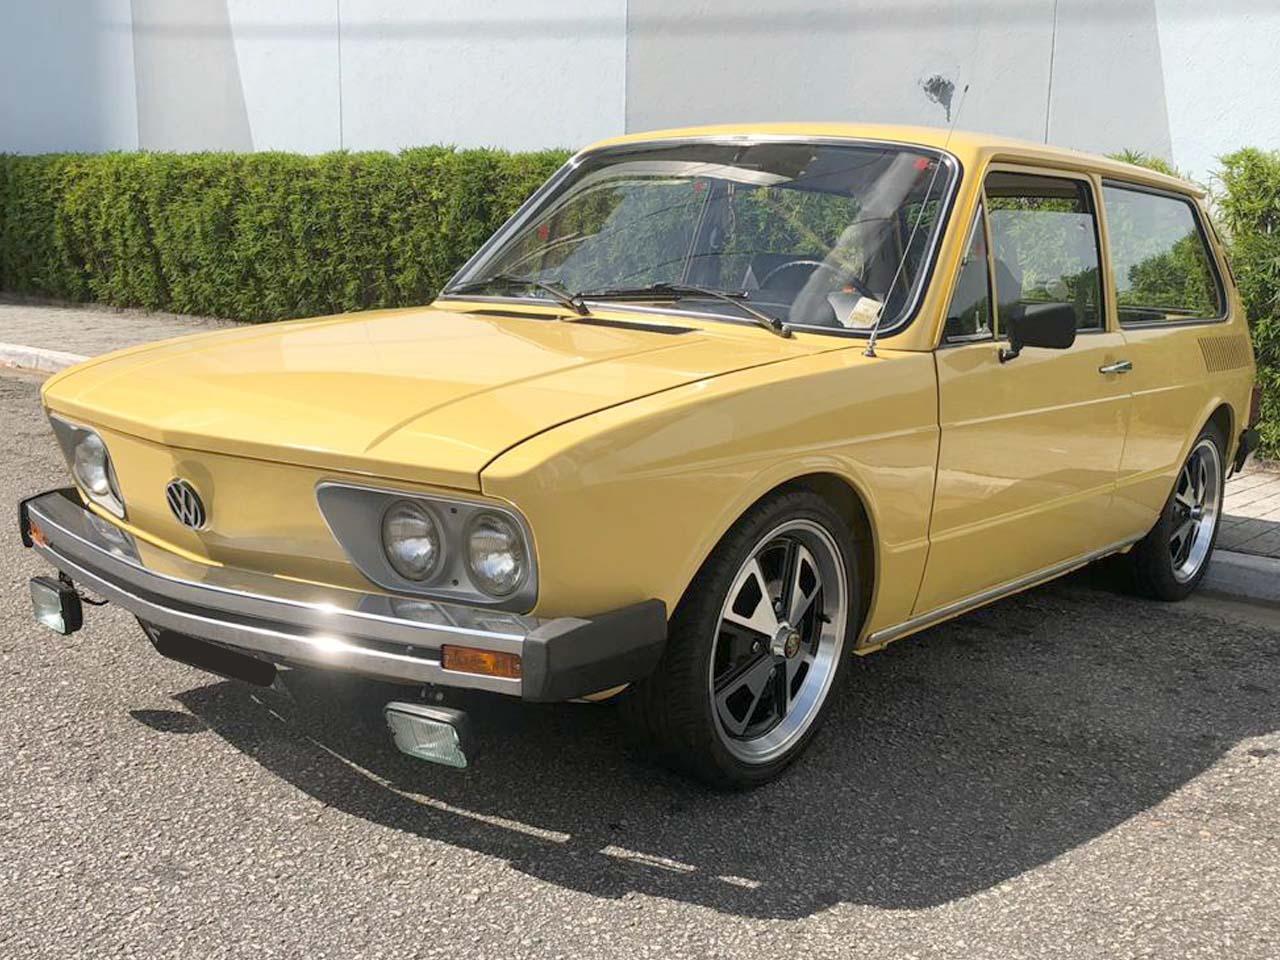 VW Brasilia Amarela 1980 – tag 29